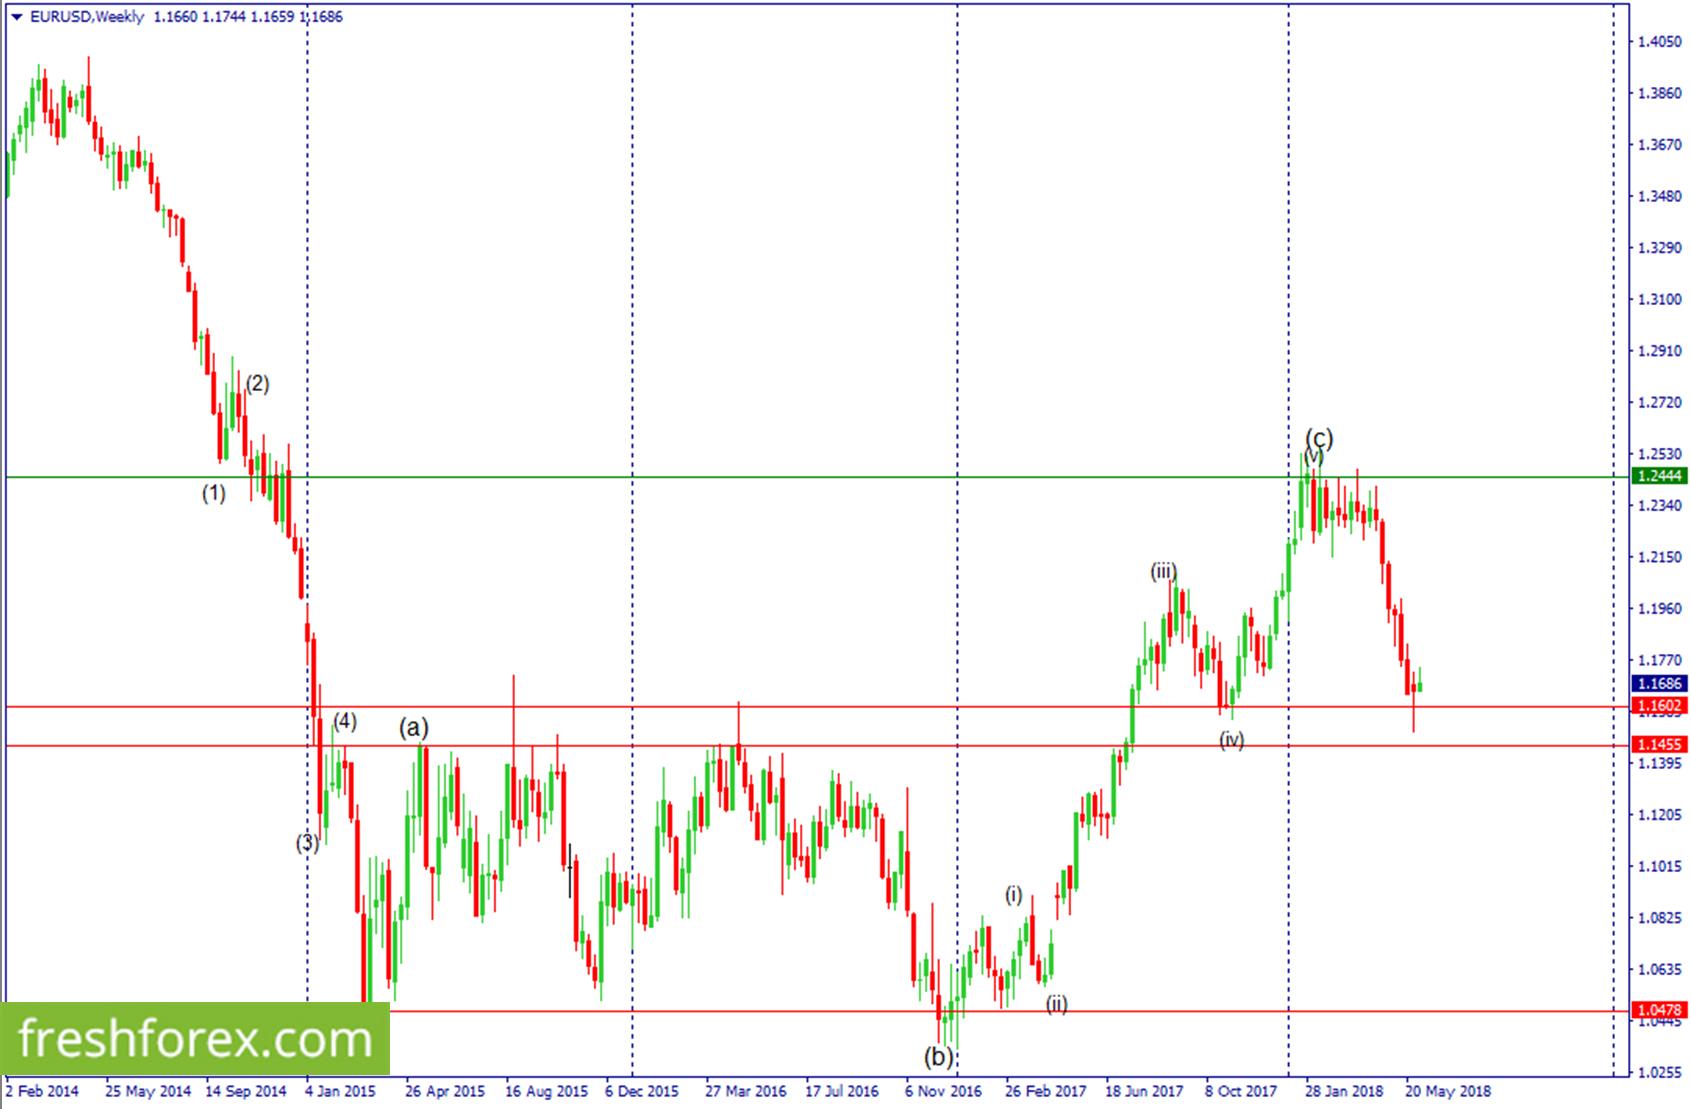 Buy euro around 1.1502